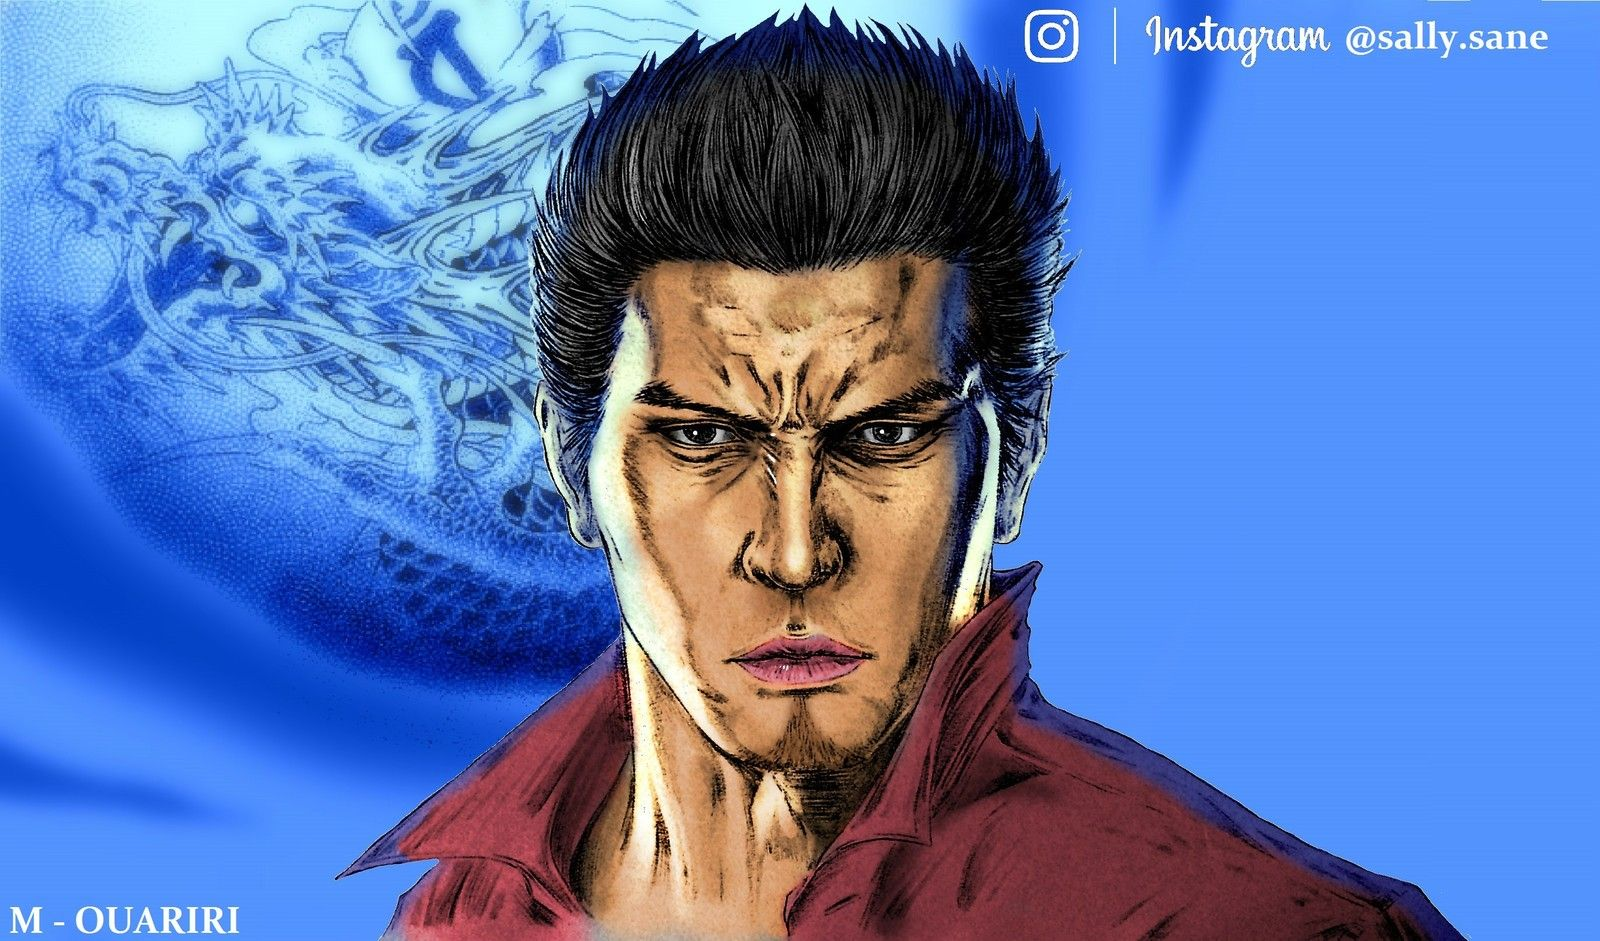 Legendary Blue Dragon Kiryu Kazuma Of Yakuza By Saladin Sane